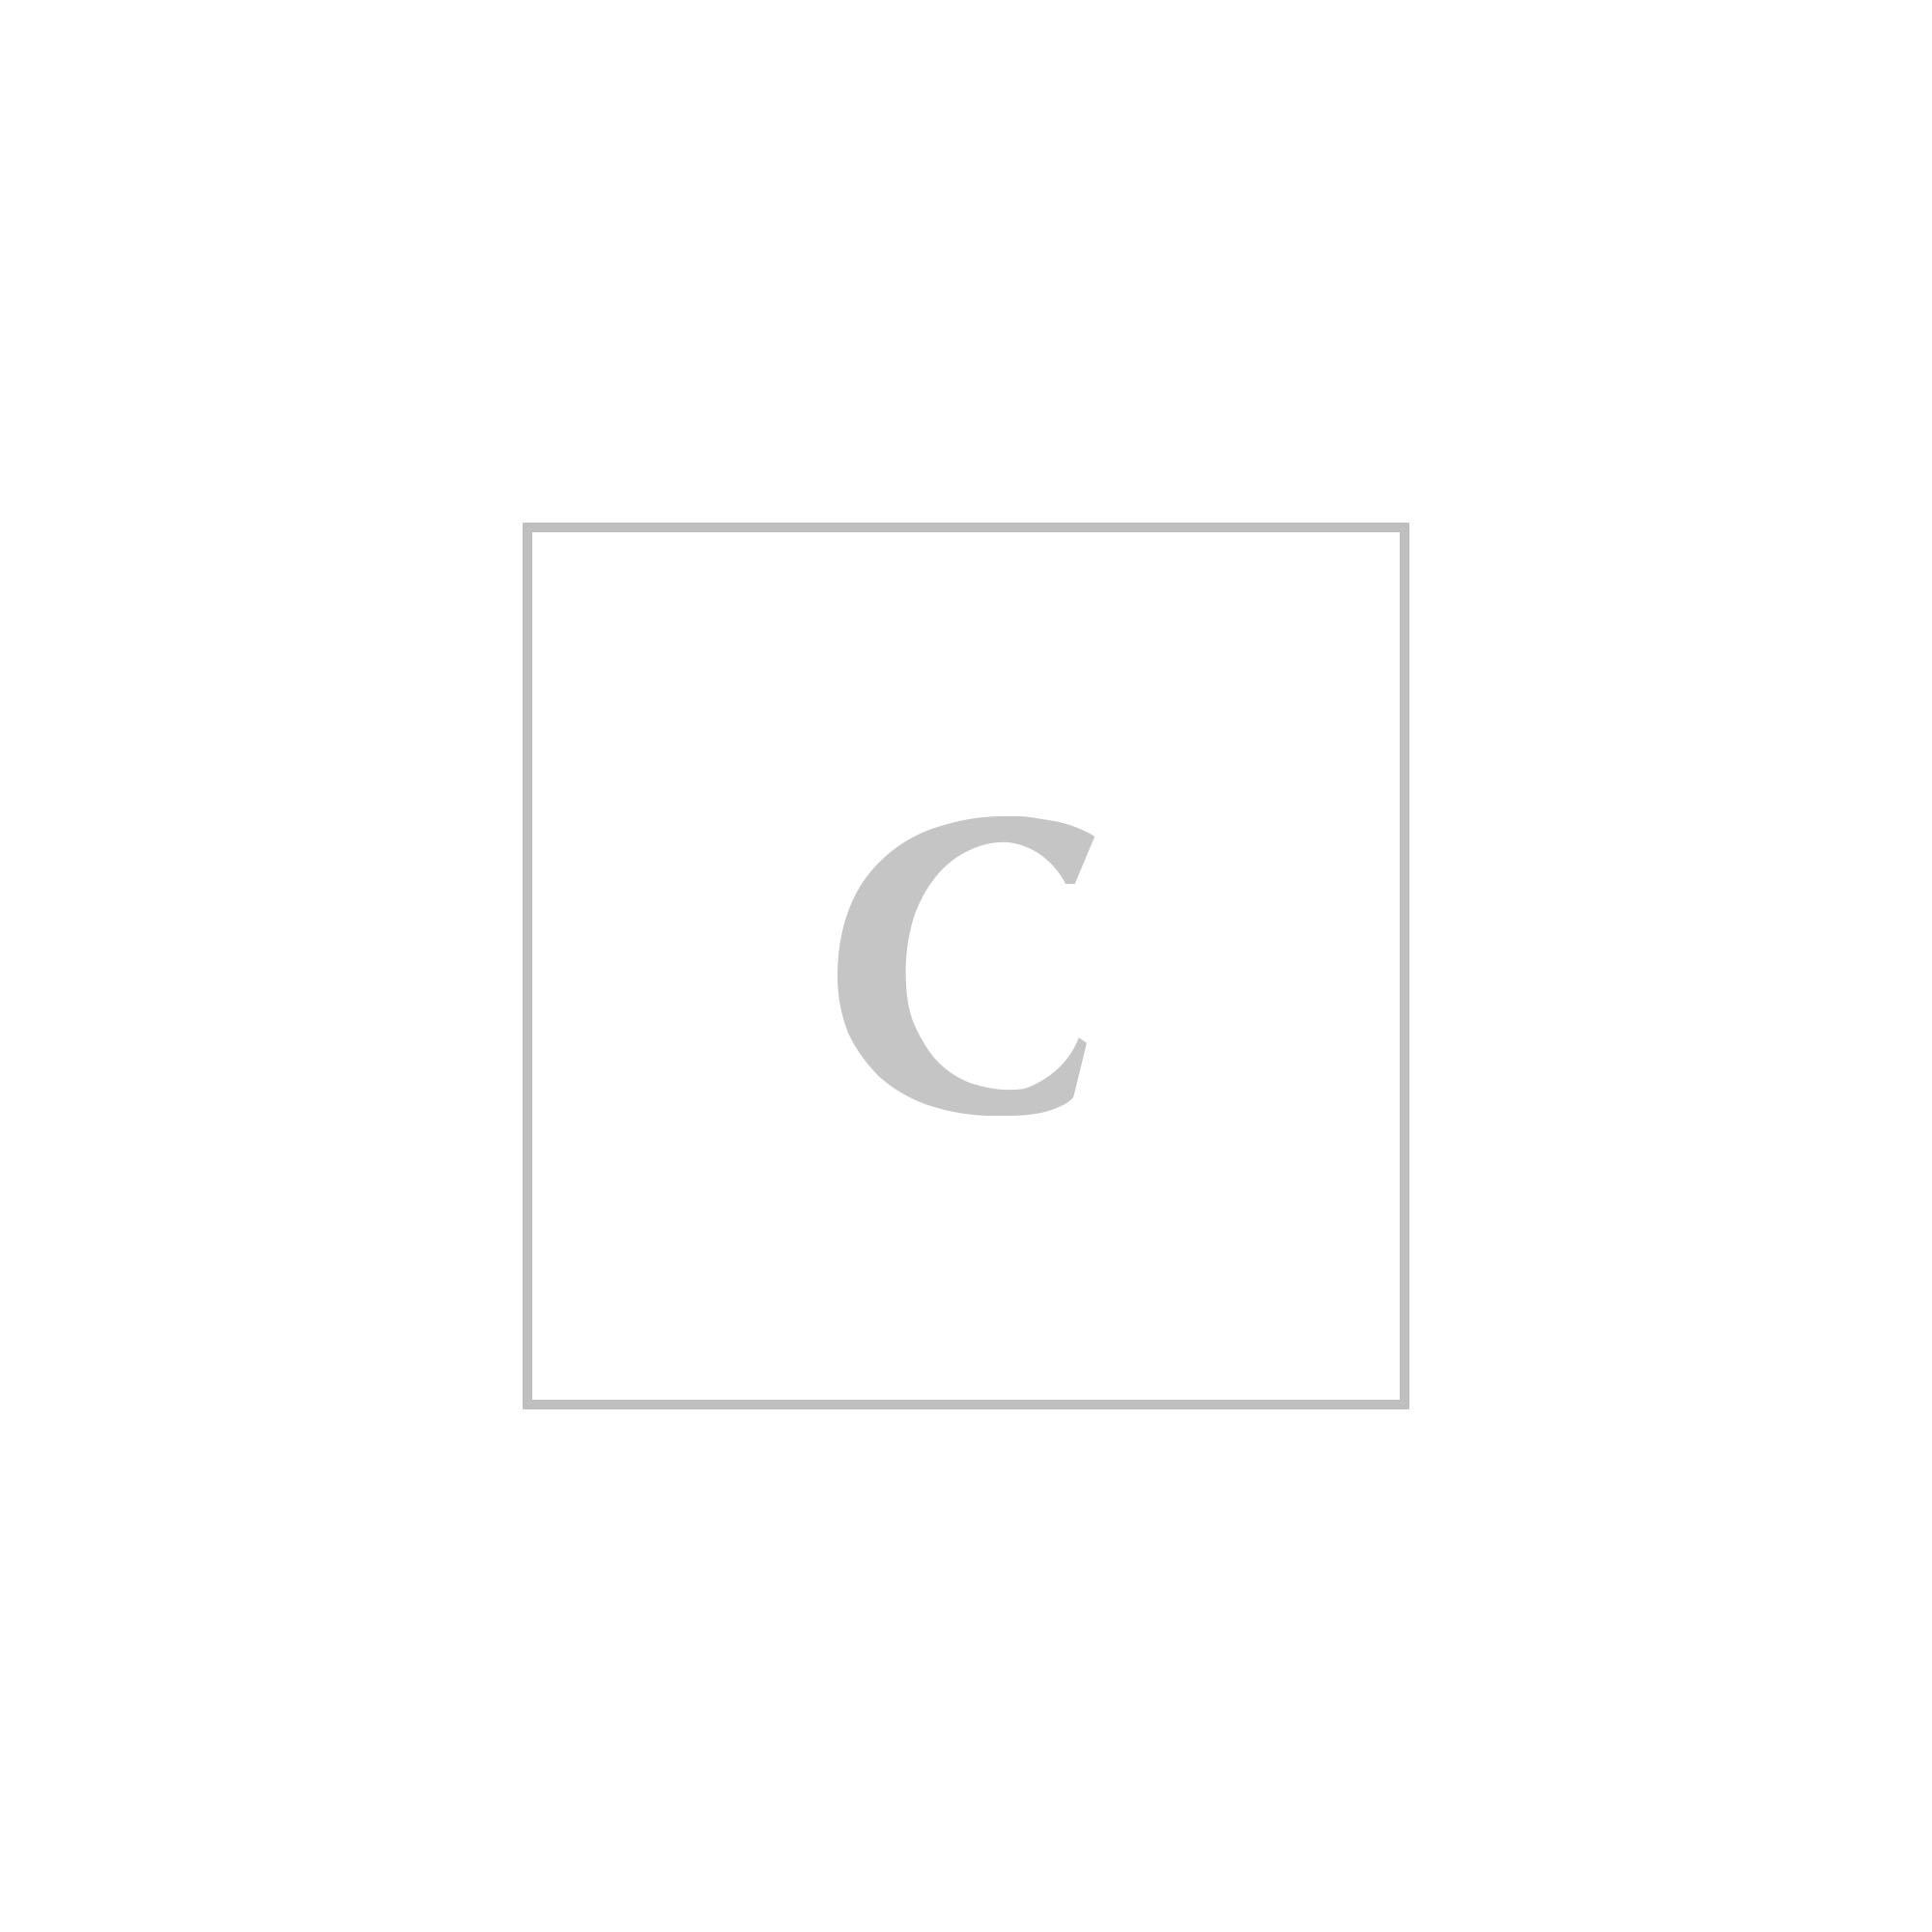 new styles a1017 096b8 Moncler Basic Giacconi da Uomo Blu